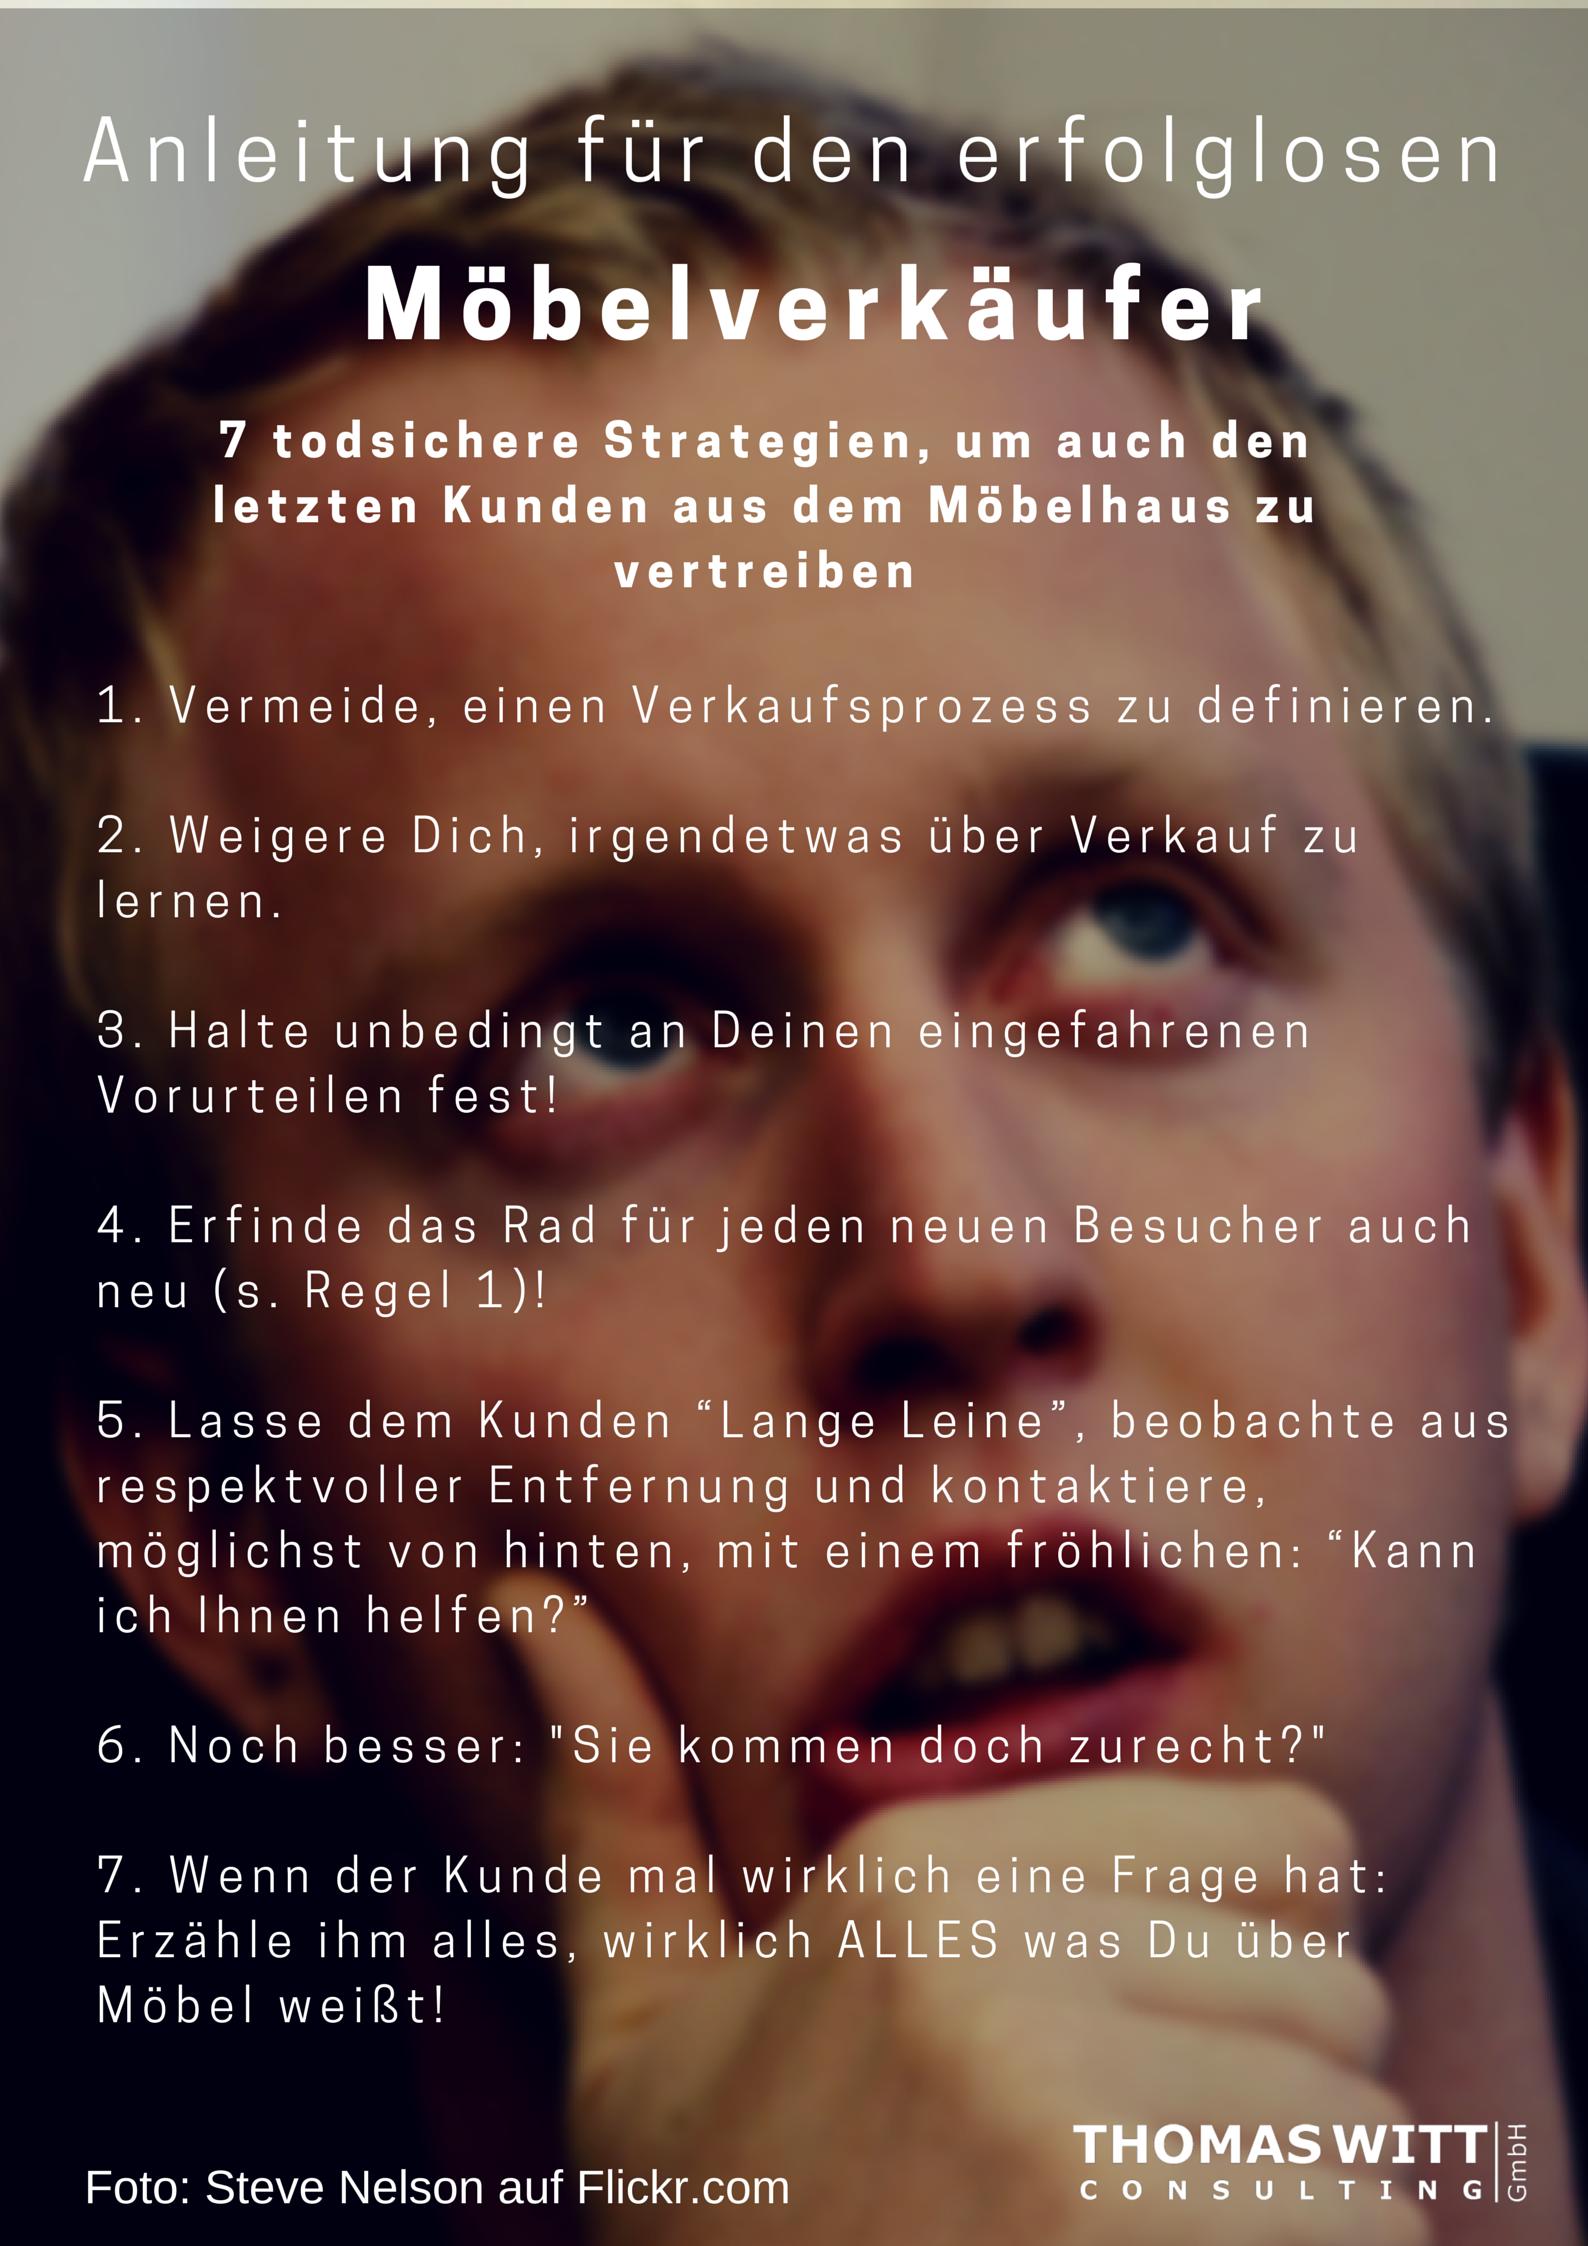 Anleitung-erfolglose-moebelverkaeufer-thomas-witt